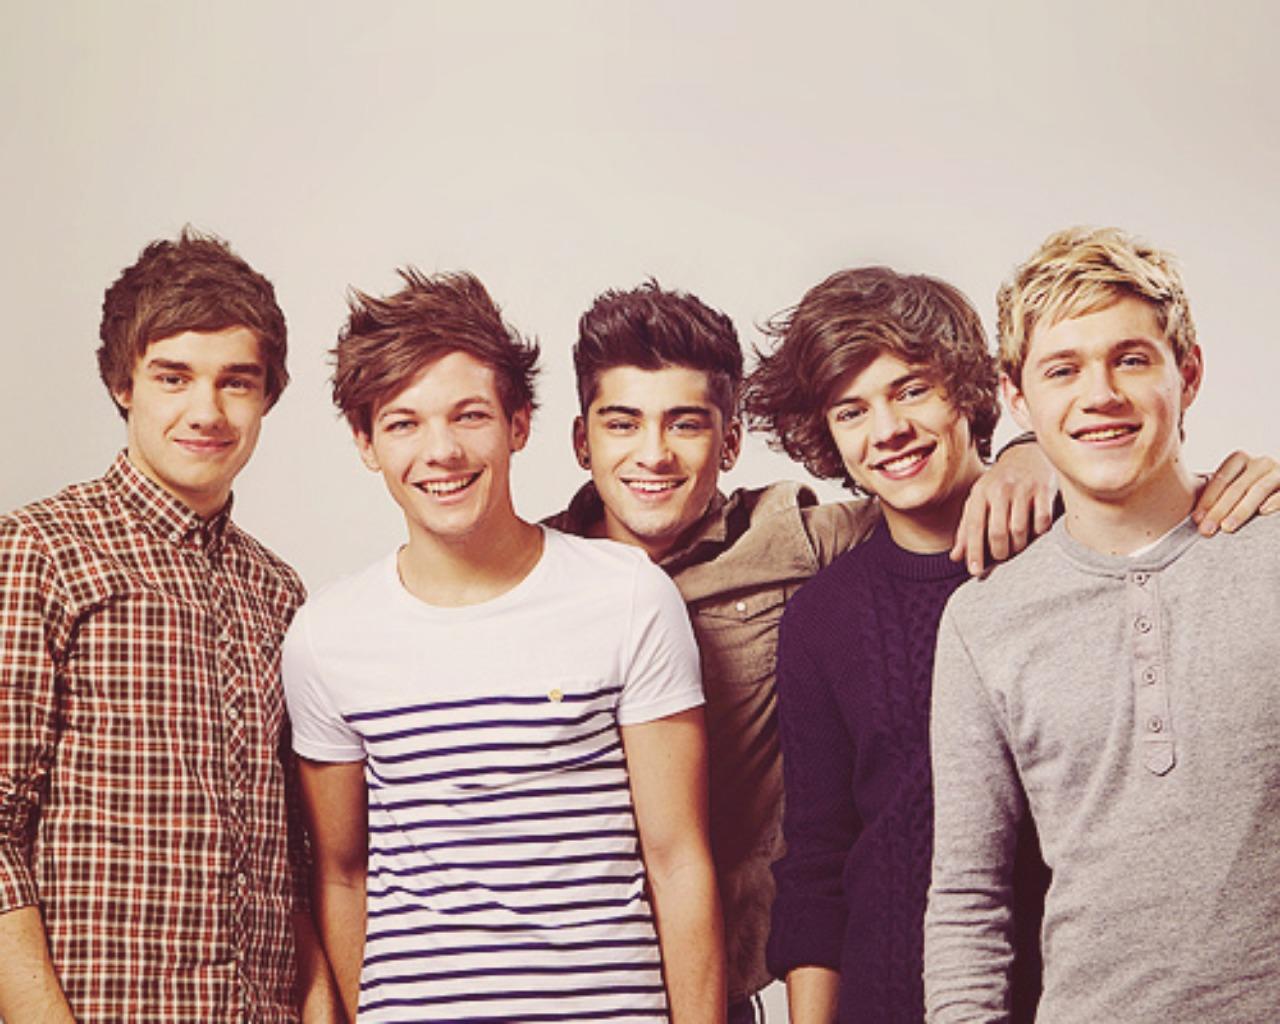 Description One Direction HD Wallpaper is a hi res Wallpaper for pc 1280x1024